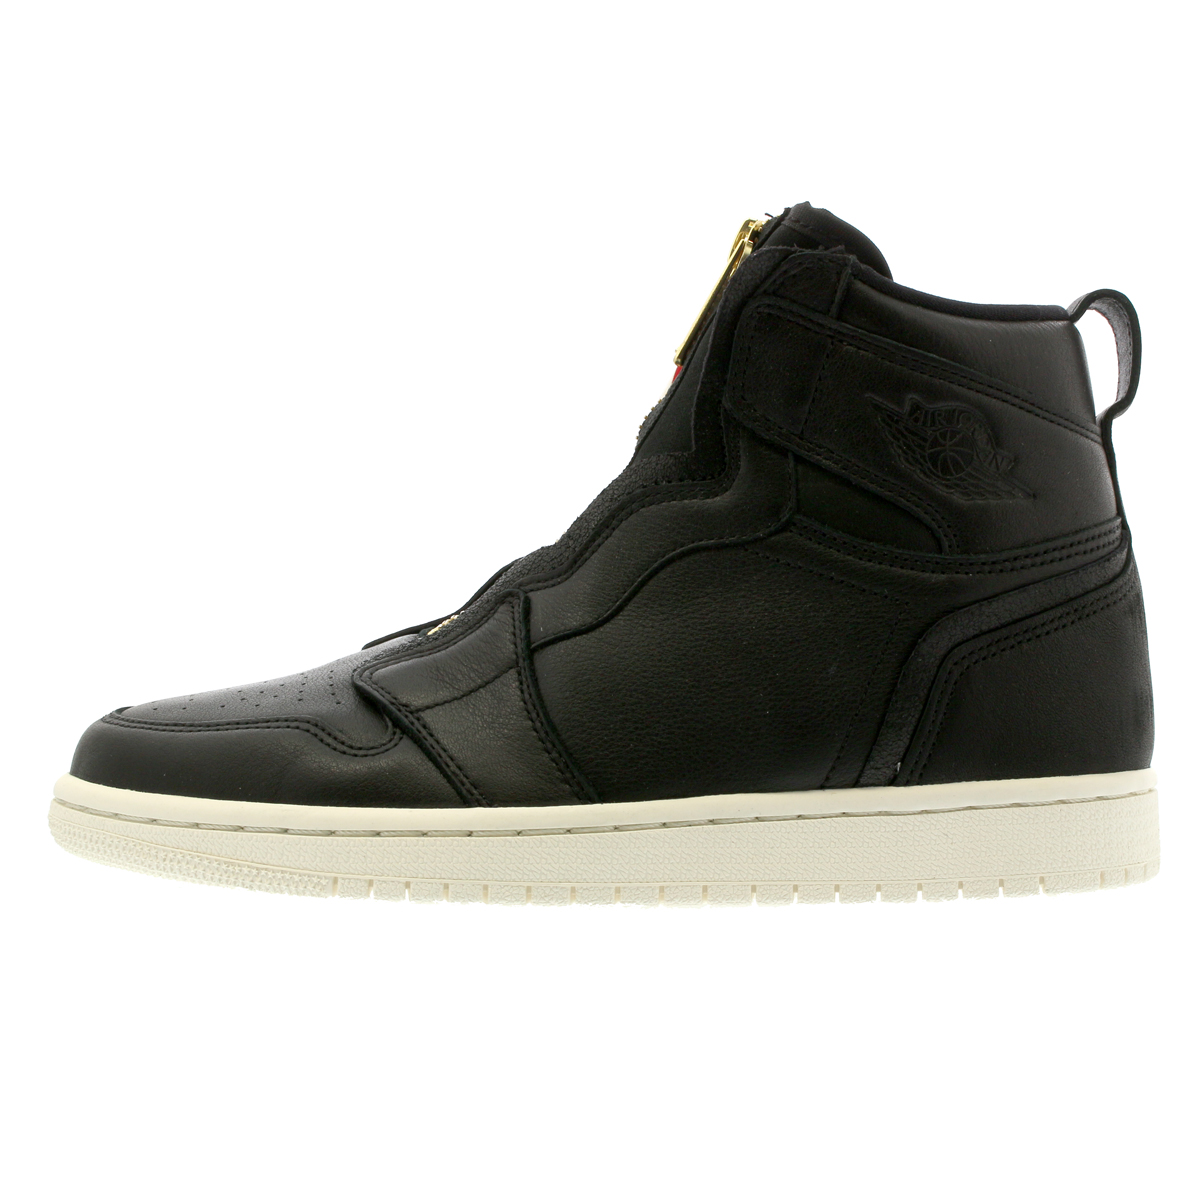 Lowtex Big Small Shop Nike Wmns Air Jordan 1 High Zip